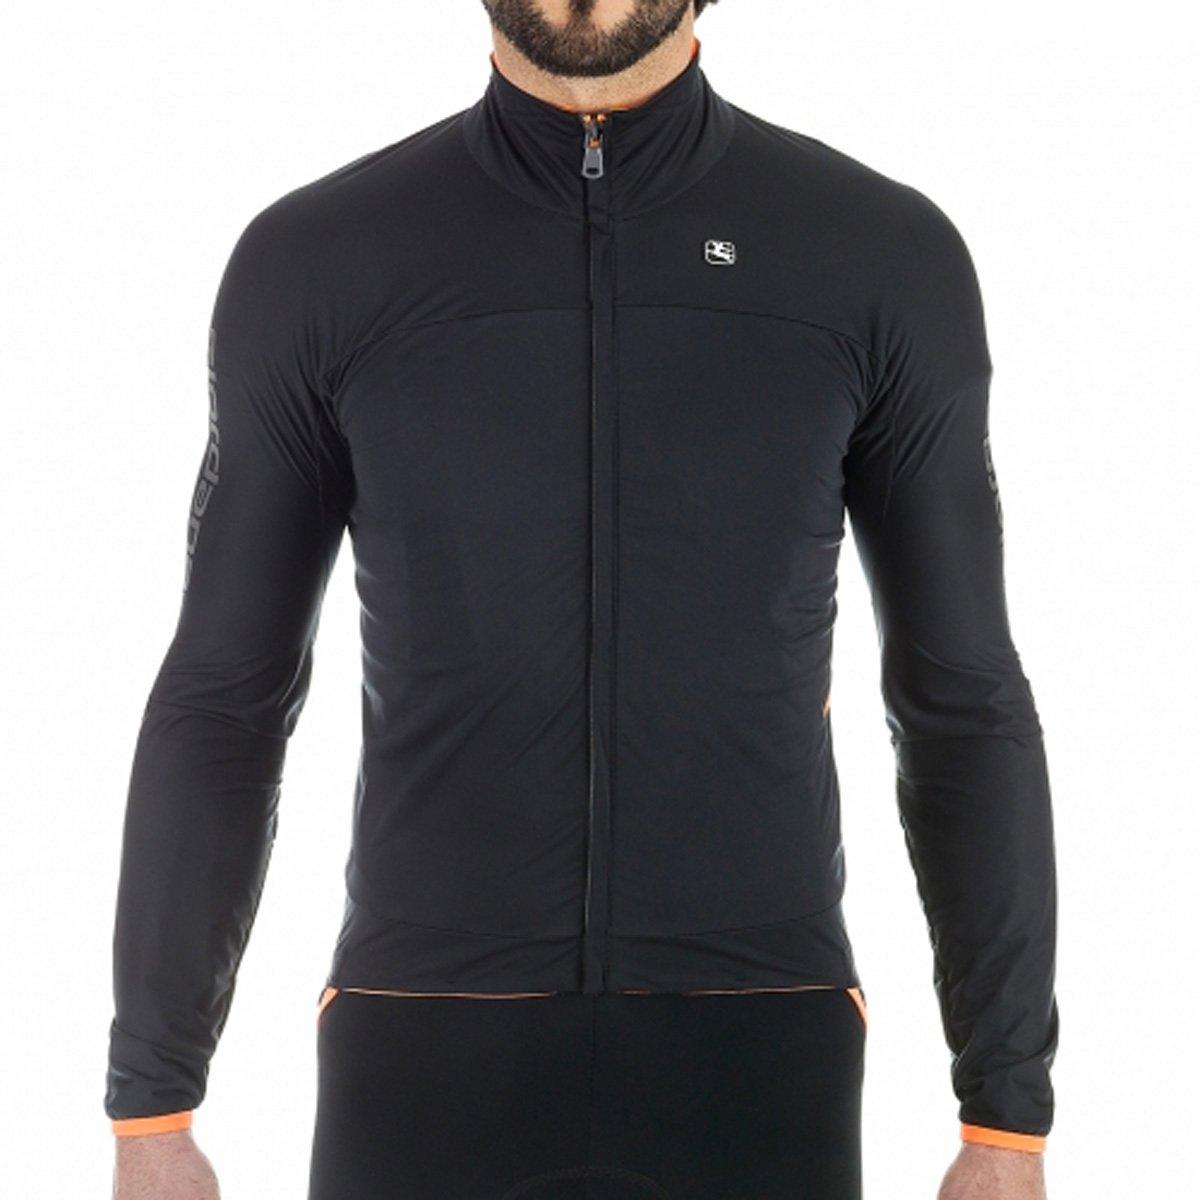 Giordana 2017 /18 Men 's Aqua Vento 100 h20サイクリングジャケット – gicw16-jckt-1h20 B076D75CH5 4L|ブラック ブラック 4L